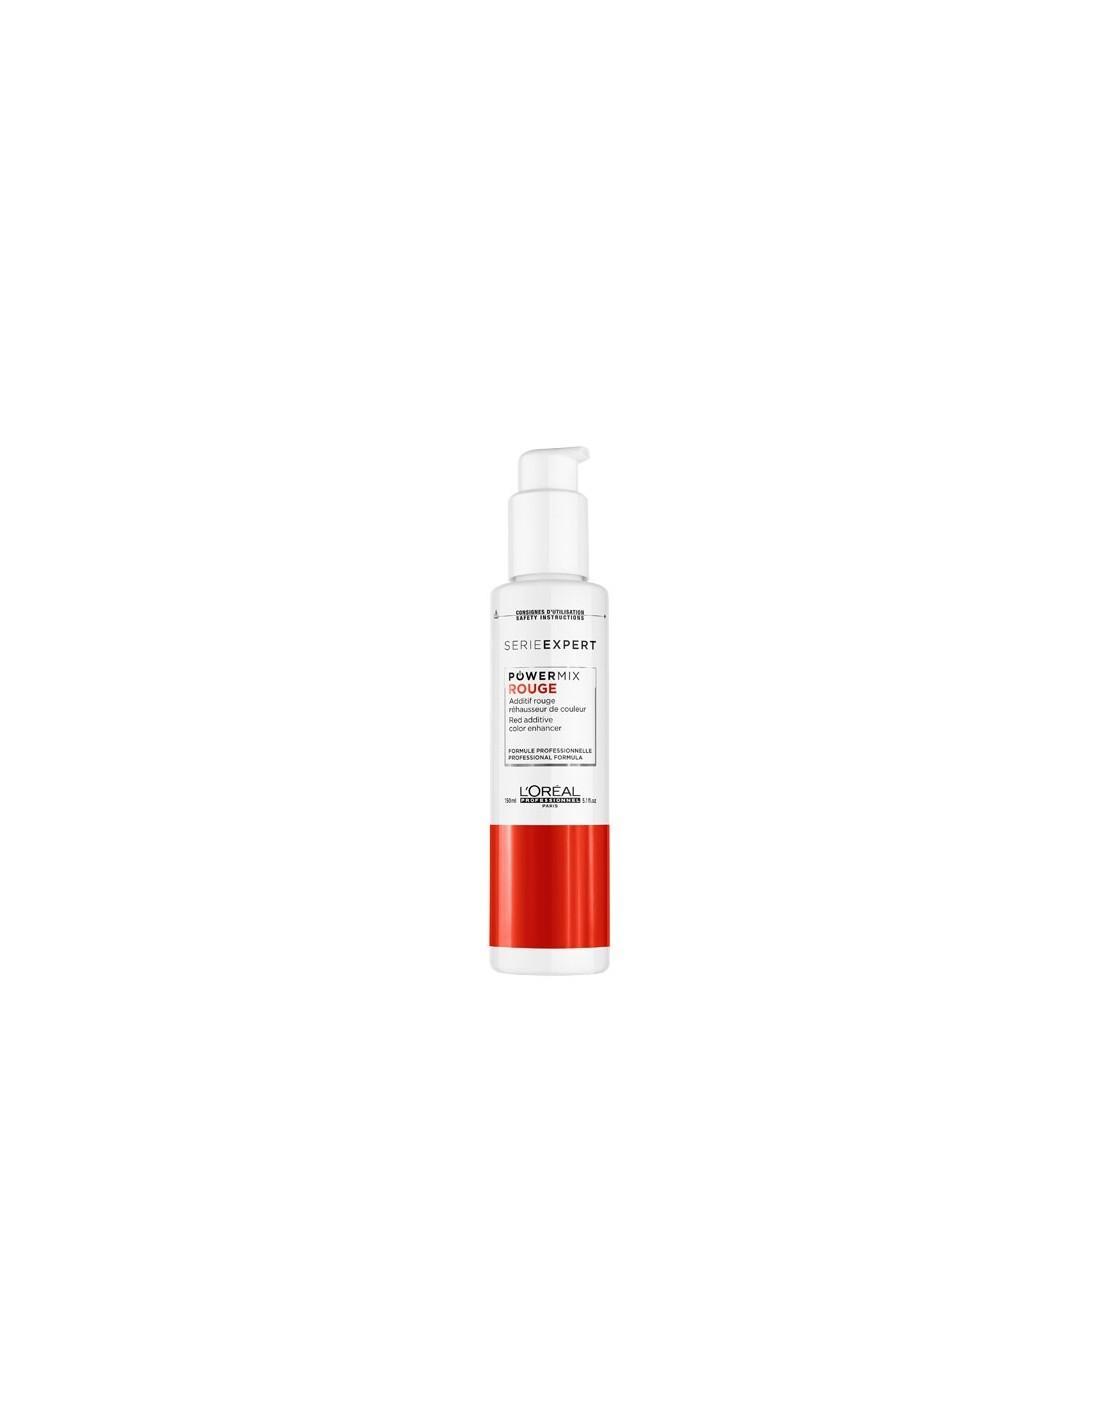 L'OREAL POWERMIX RED 150ML